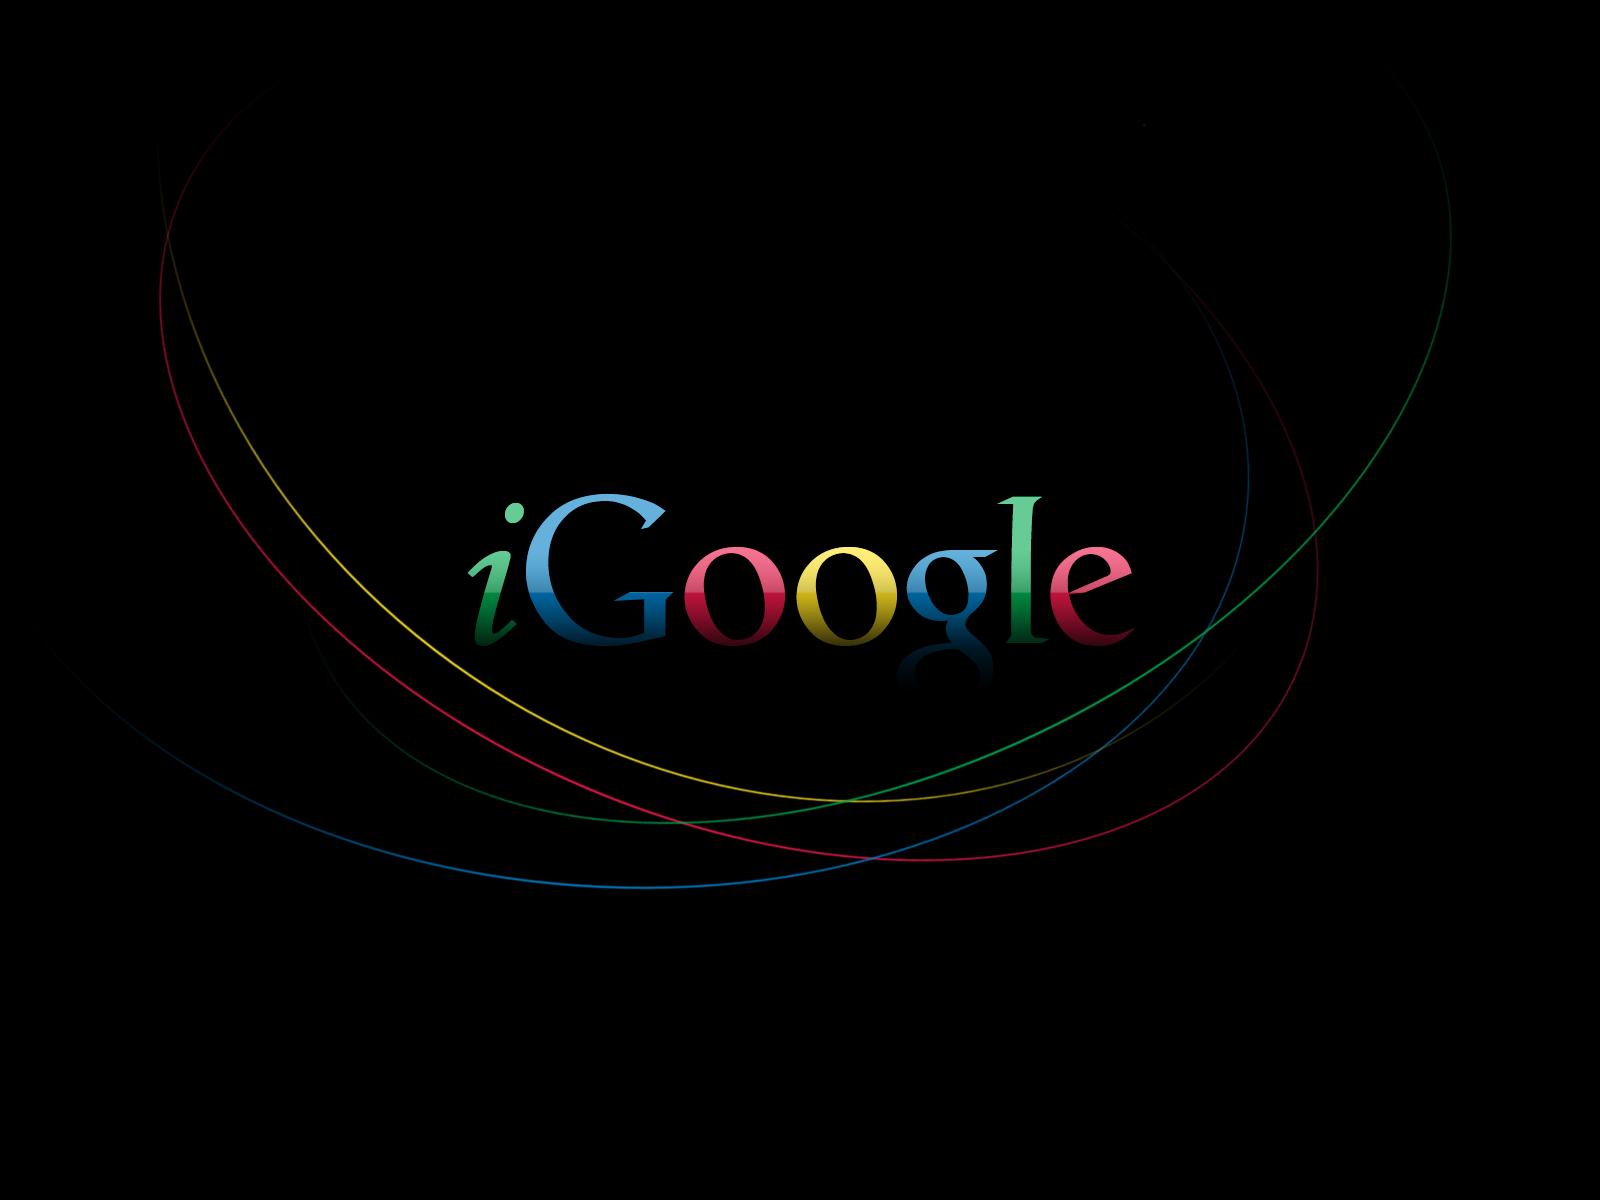 http://1.bp.blogspot.com/-9QplDsbaU5w/Tcv9kweT0wI/AAAAAAAACcs/lU8SOuUkycY/s1600/igooglewallpaperid2.png